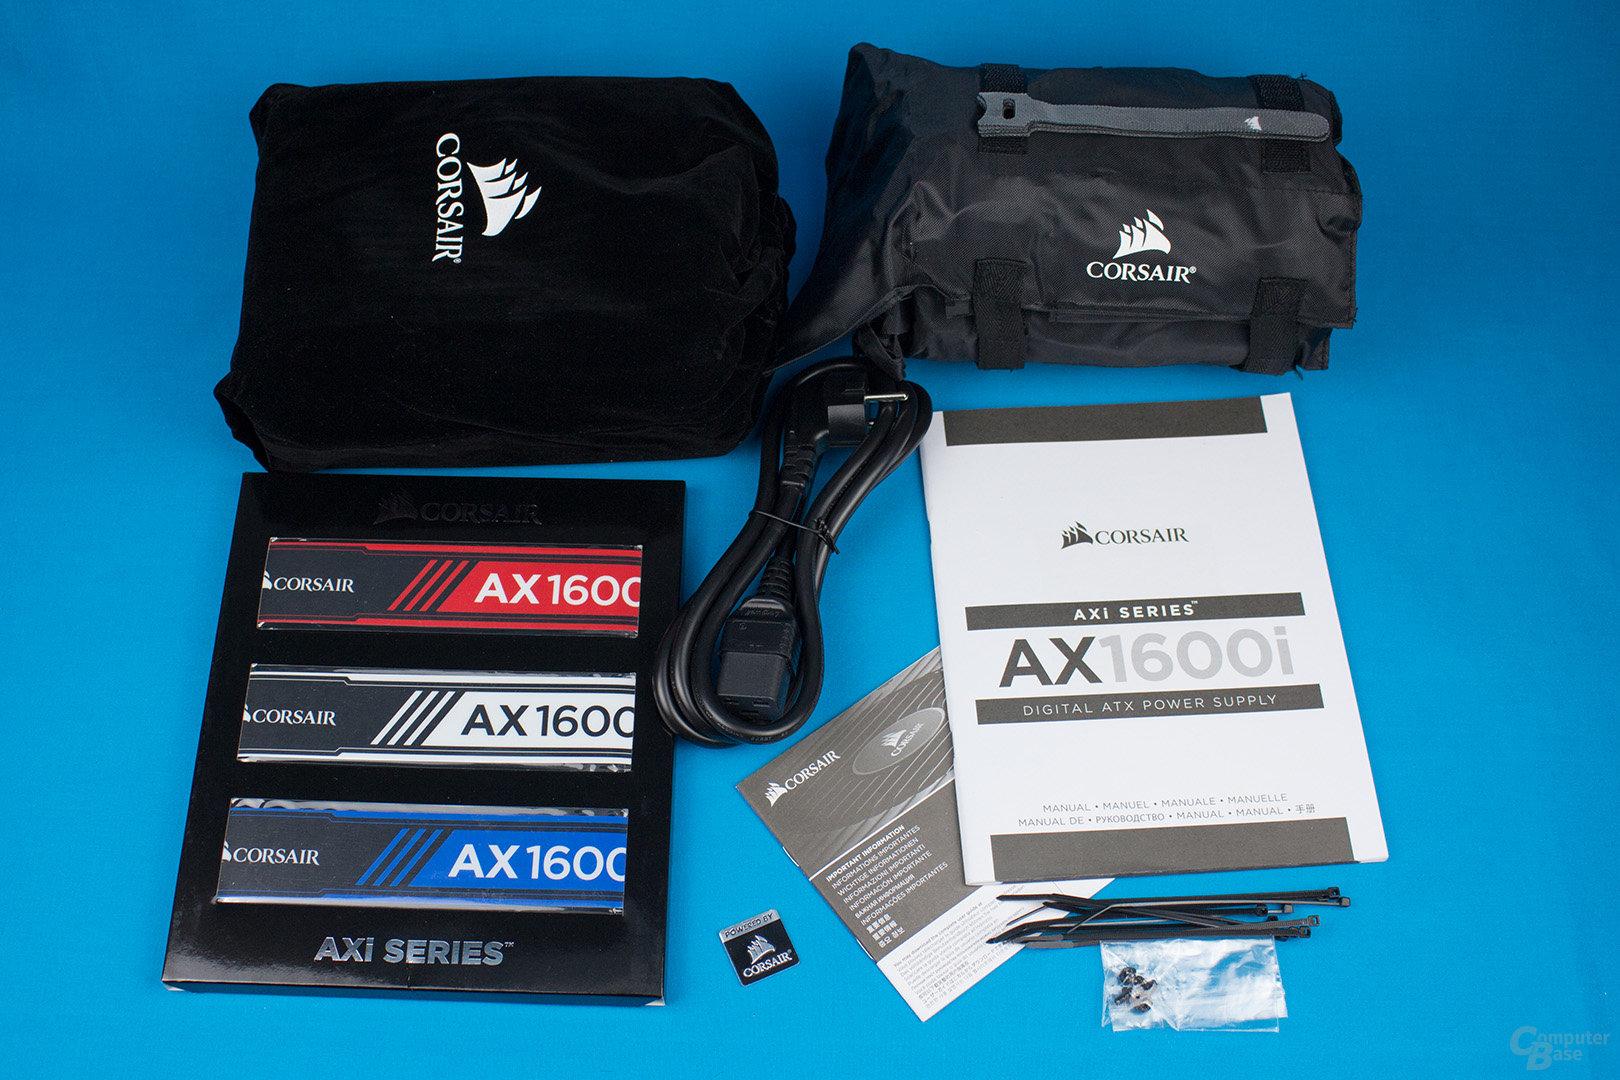 Corsair AX1600i – Lieferumfang